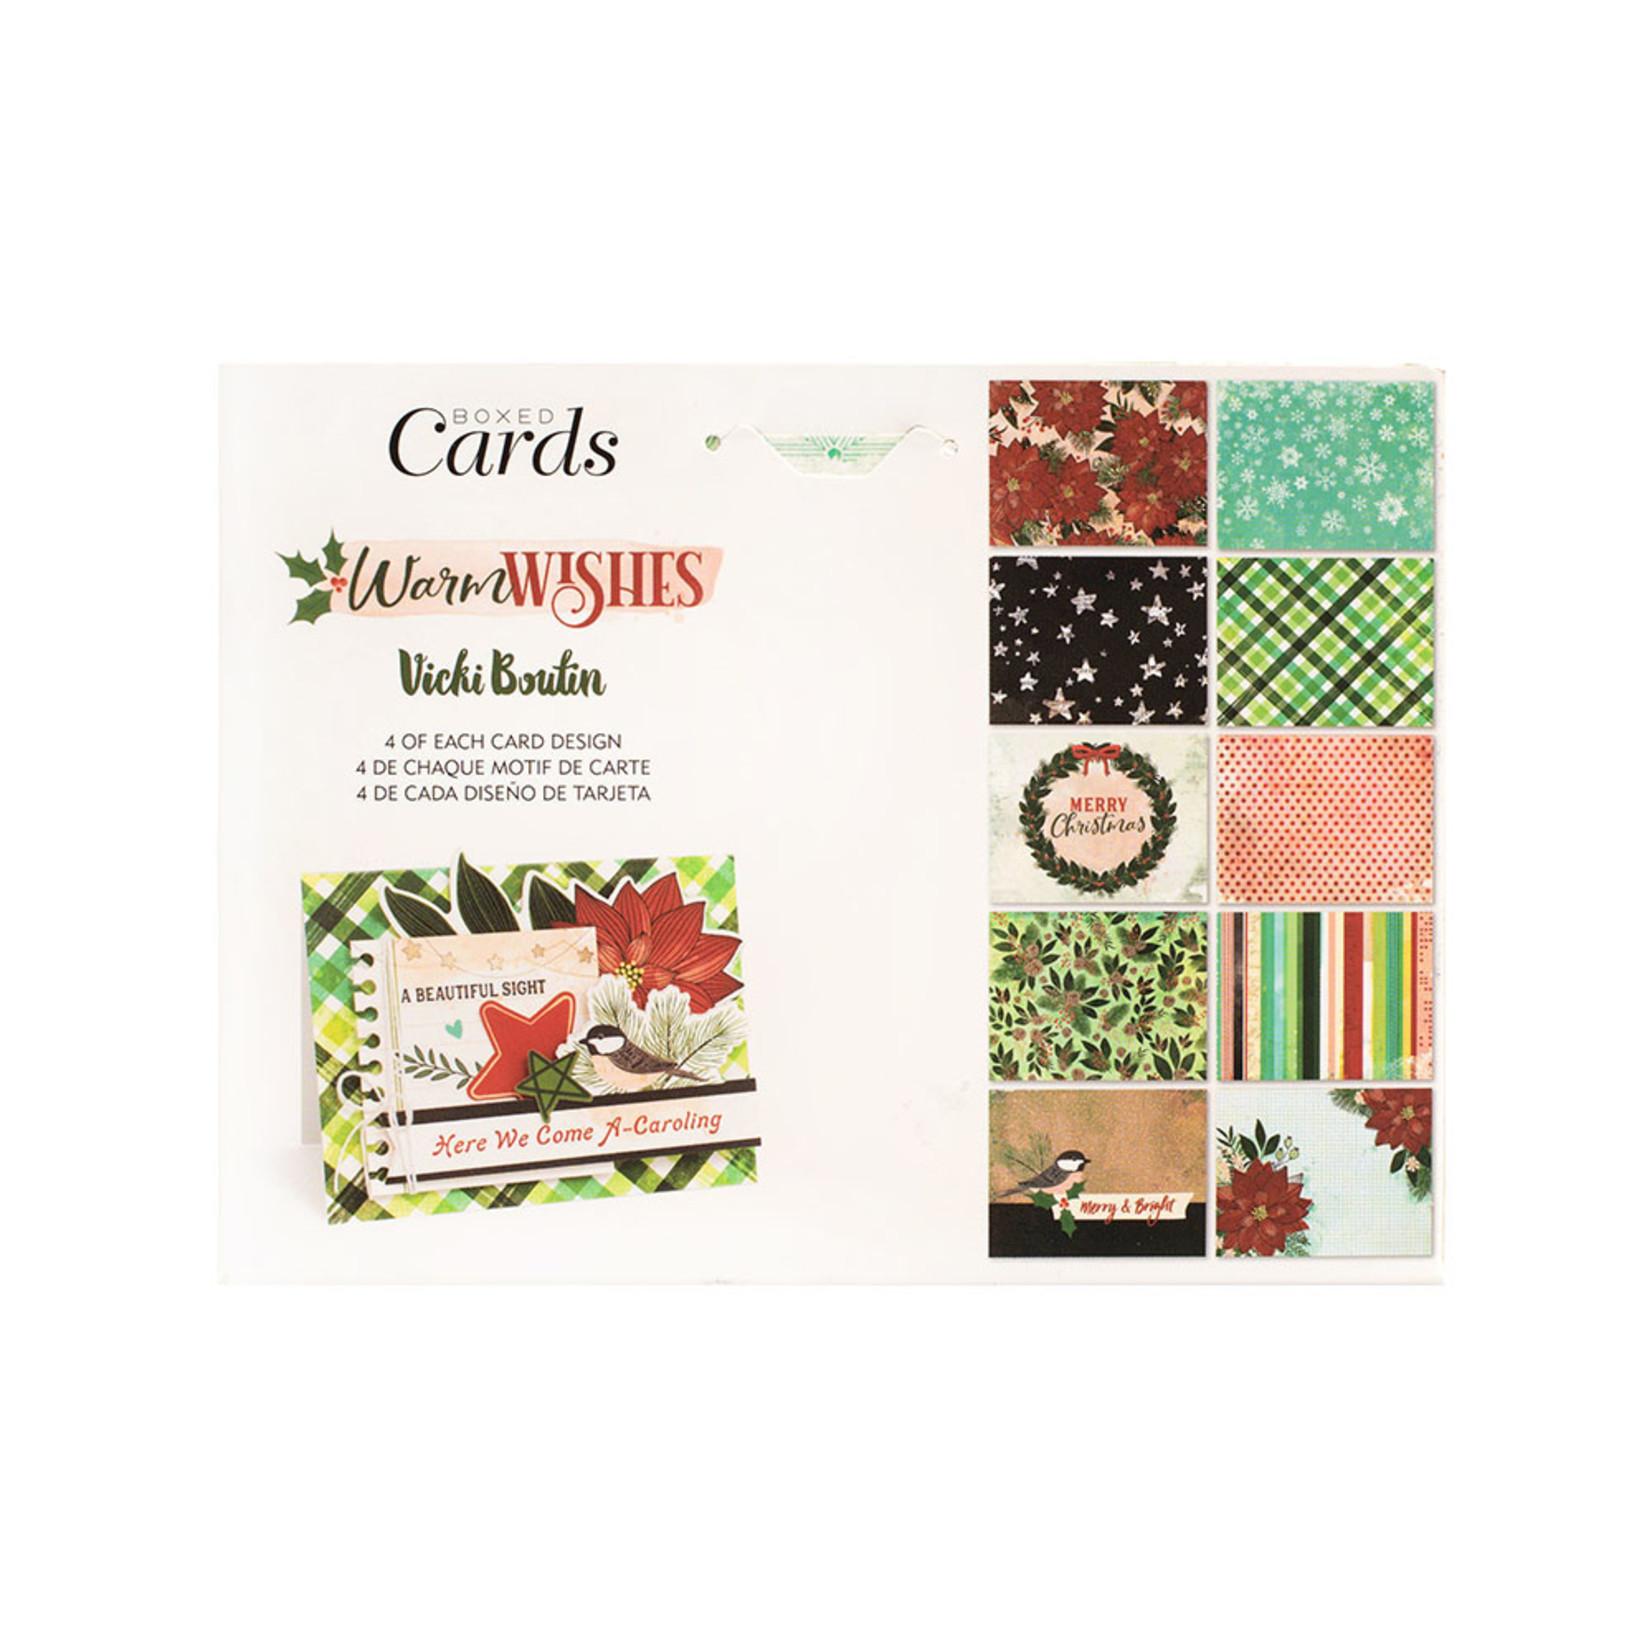 Vicki Boutin Vicki Boutin - Warm Wishes Collection - Boxed Cards